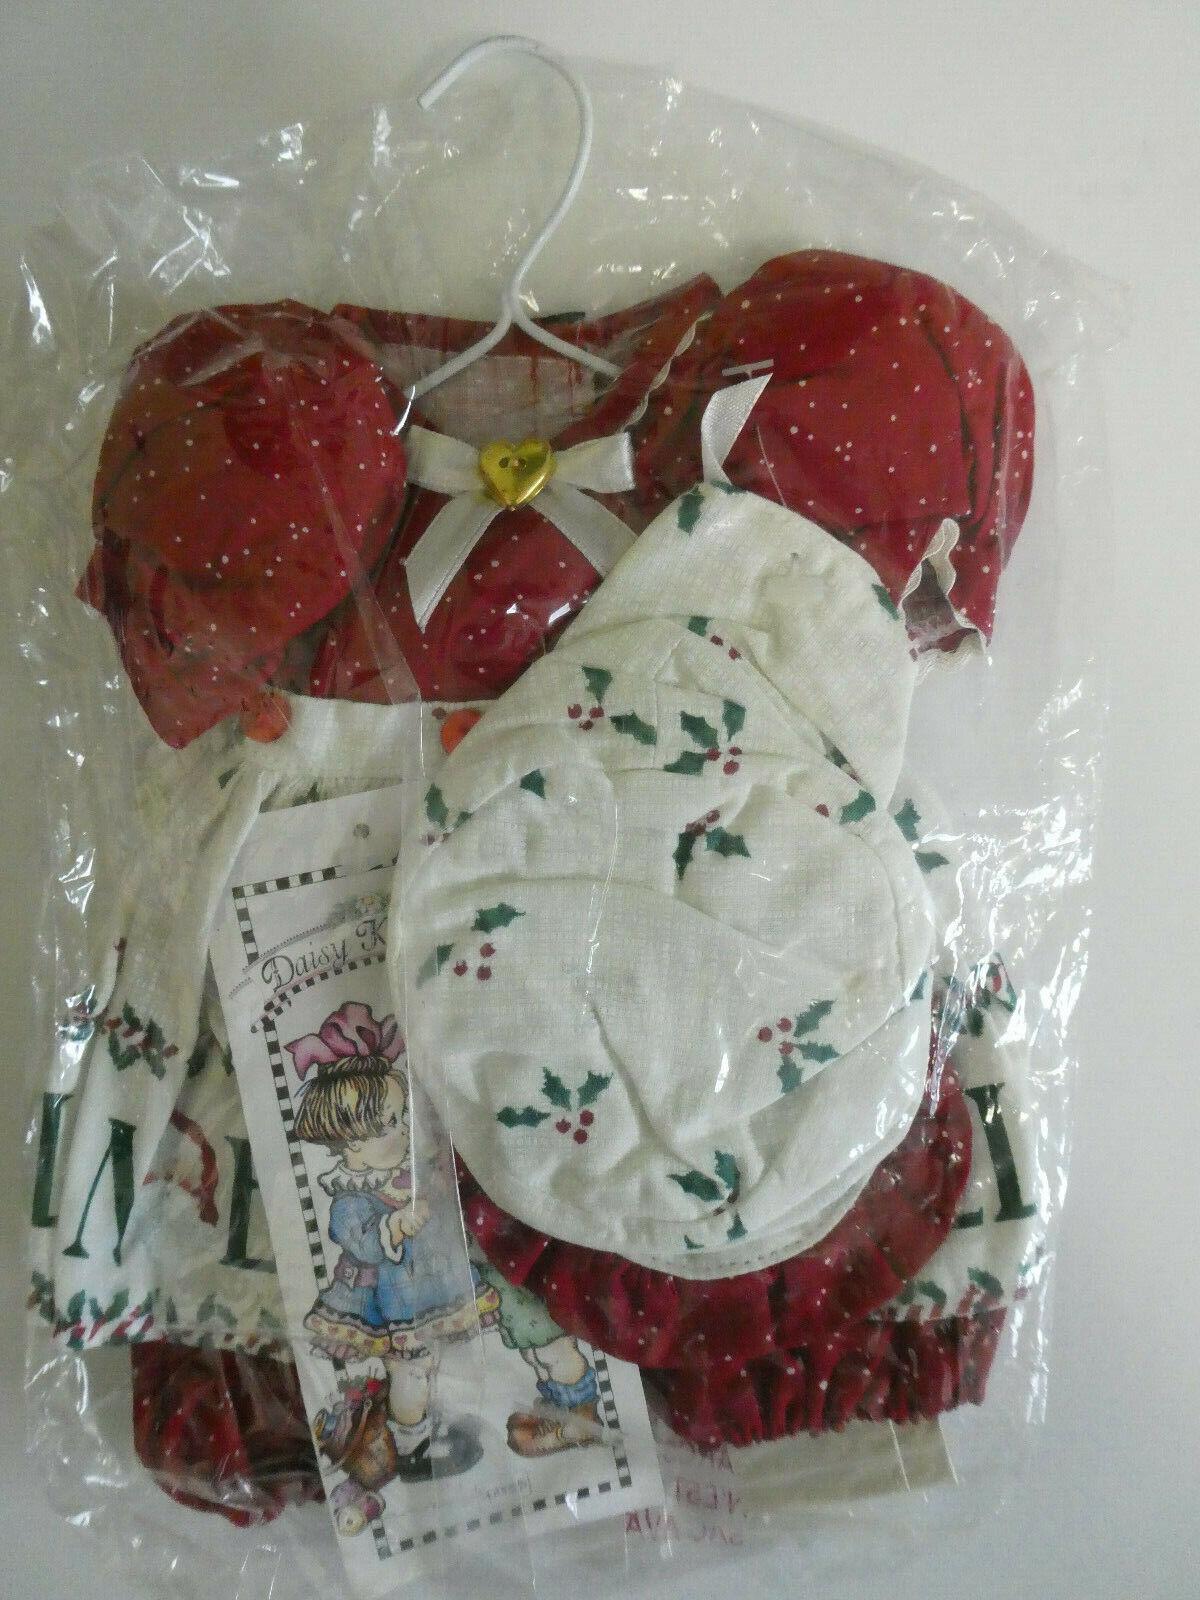 BRAND NEW DAISY KINGDOM RED APRON ROMPER HAT 4049-14593 - FITS 12 DOLL  - $19.99